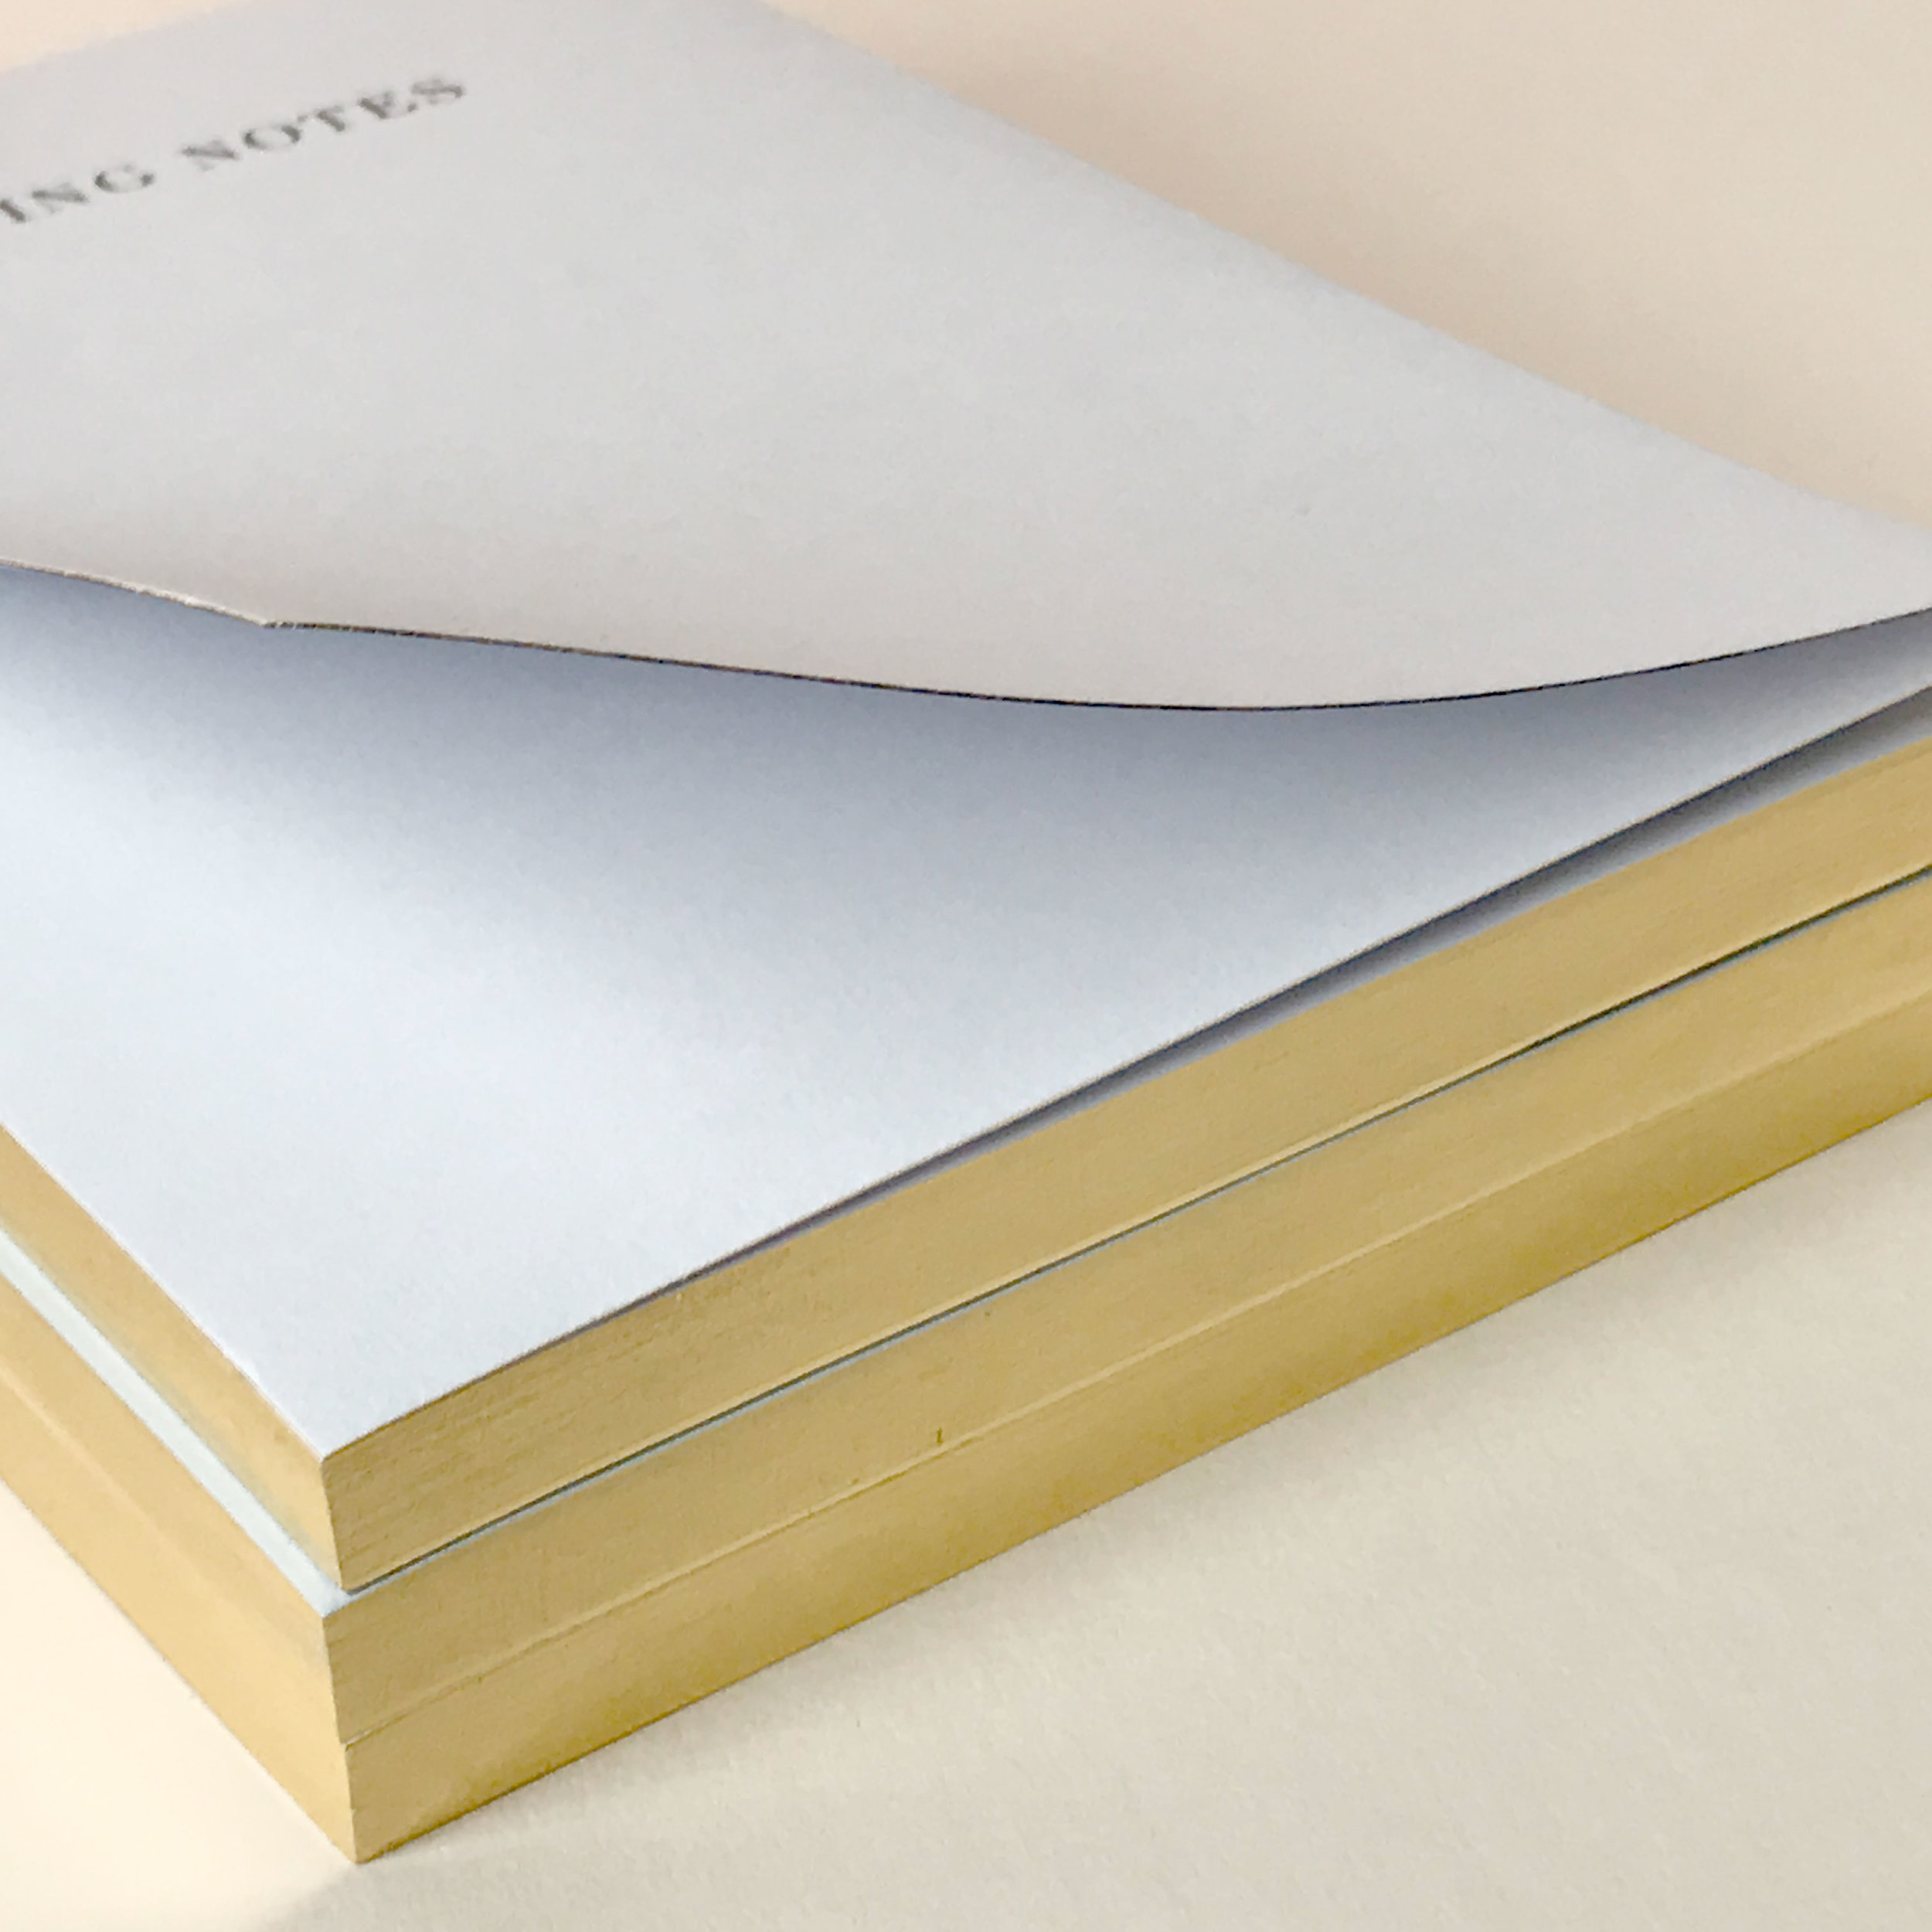 01elmo-paperstories_notepads.jpeg